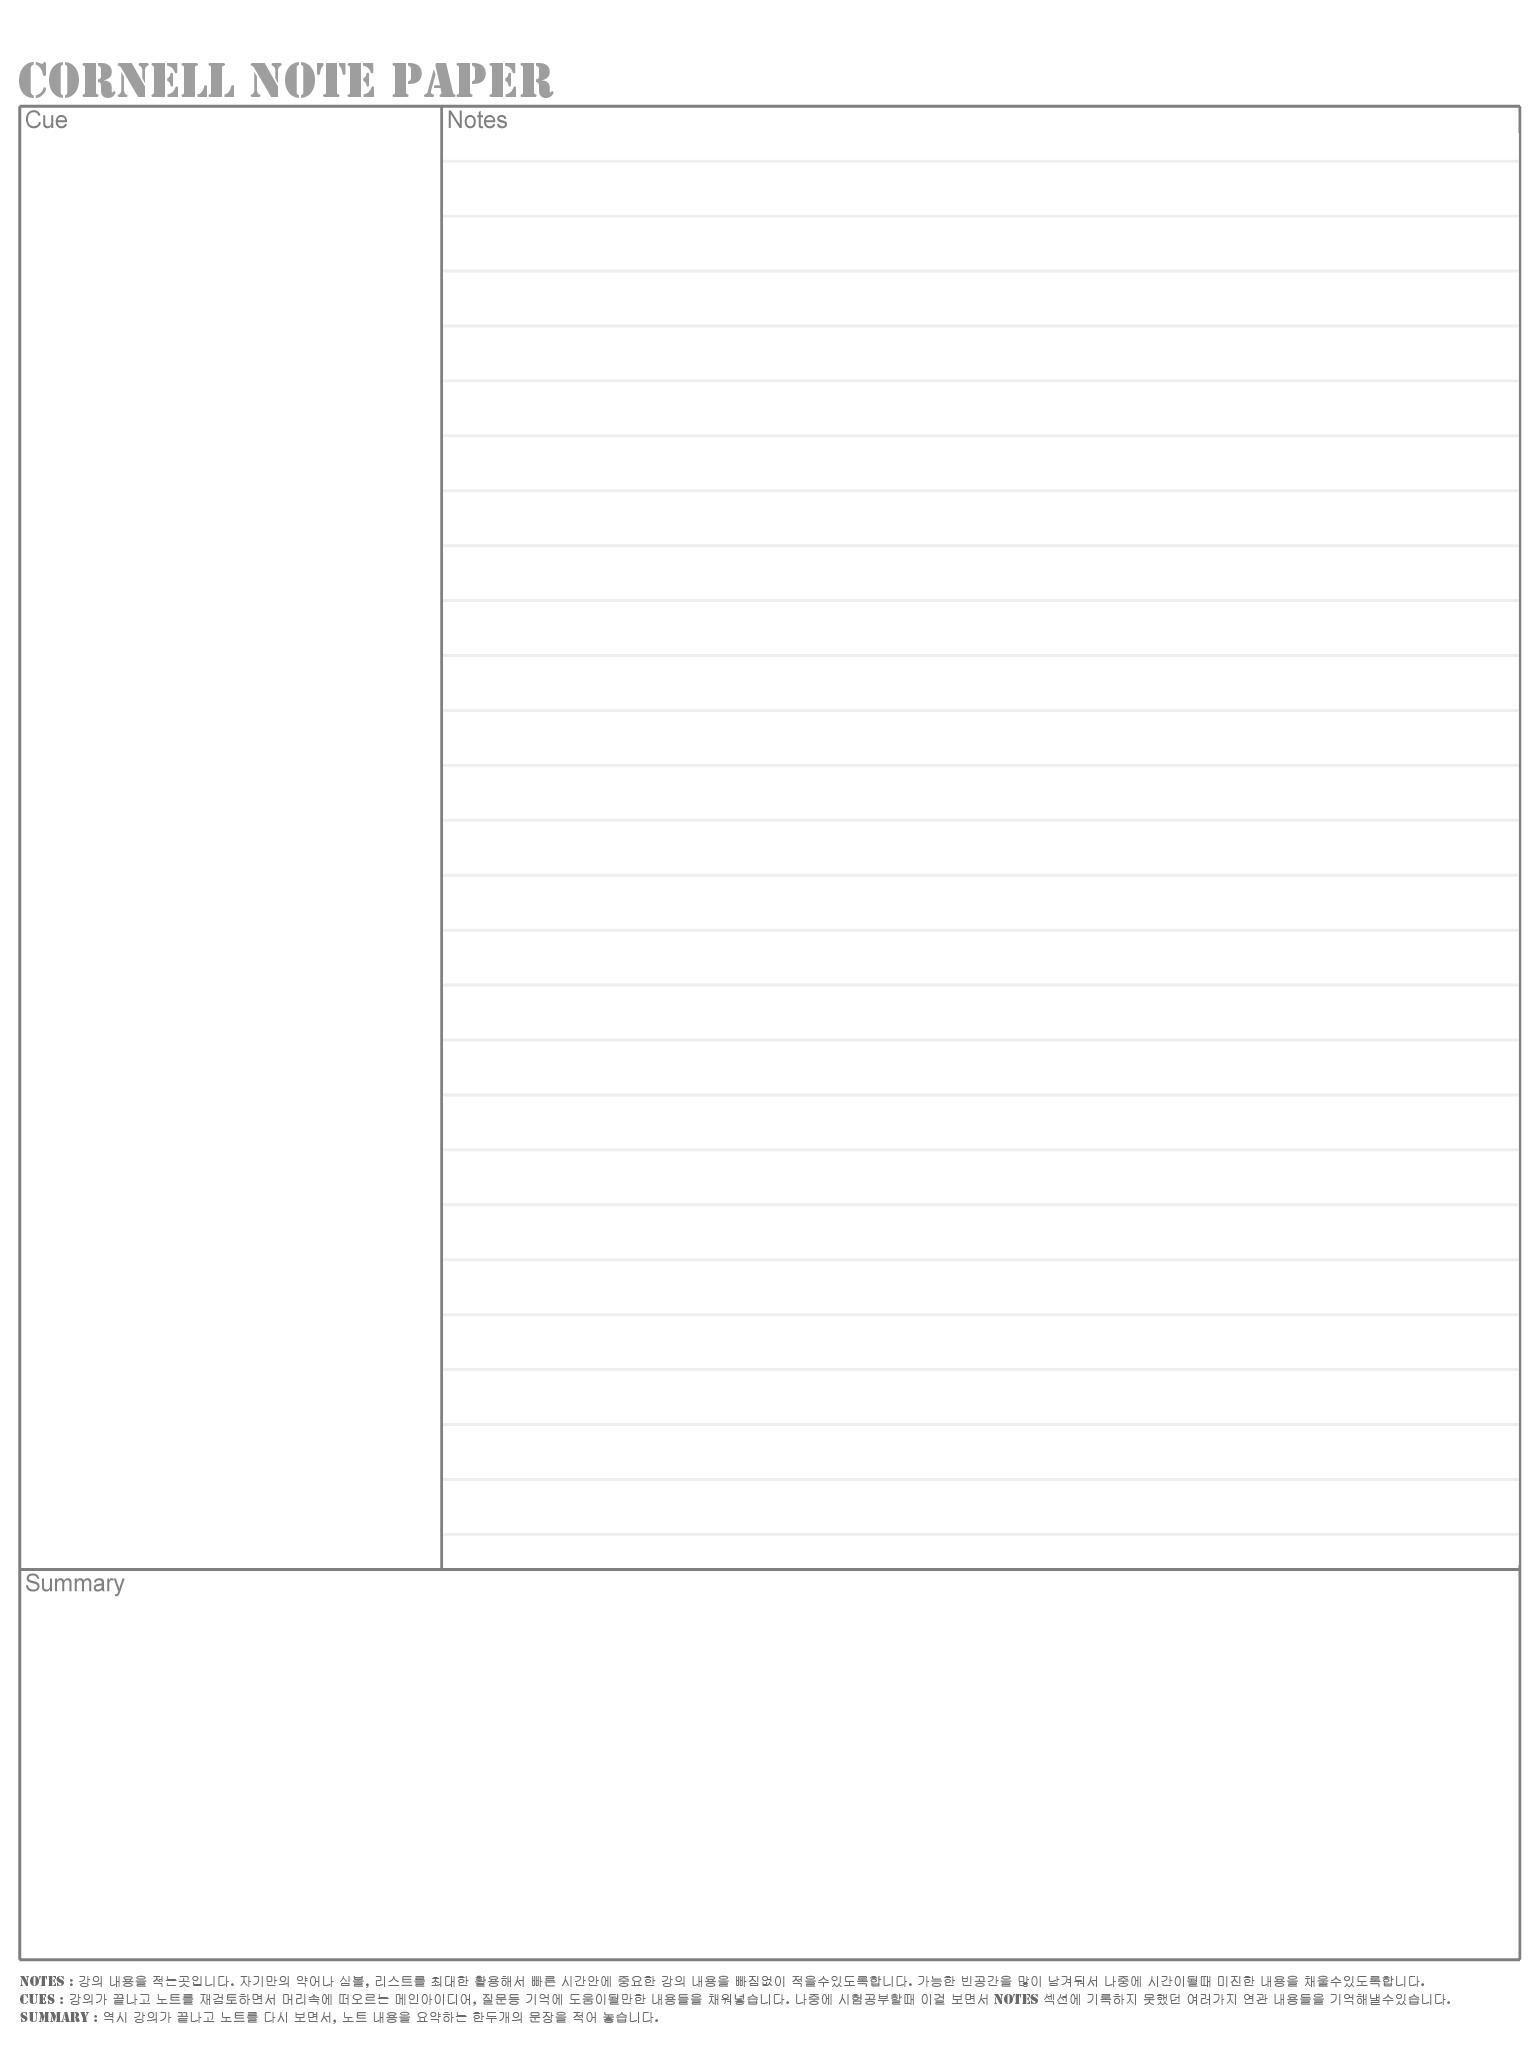 CCAMI, Computer, cornell, cornell note, IT, Microsoft, note taking, Office, Office 2013, onenote, onenote 2013, surface, Surface PRO, surface pro3, 기록, 까미, 노트, 노트필기, 리뷰, 메모, 서식, 서피스, 서피스 프로3, 양식, 엔트리그, 오피스, 오피스 2013, 와콤, 원노트, 원노트 2013, 원노트 서식 추가, 원노트 필기, 원노트 활용, 코넬, 코넬식, 코넬식 노트필기, 필기, 해상도, 효과적인, 효율적인, 효율적인 노트 필기